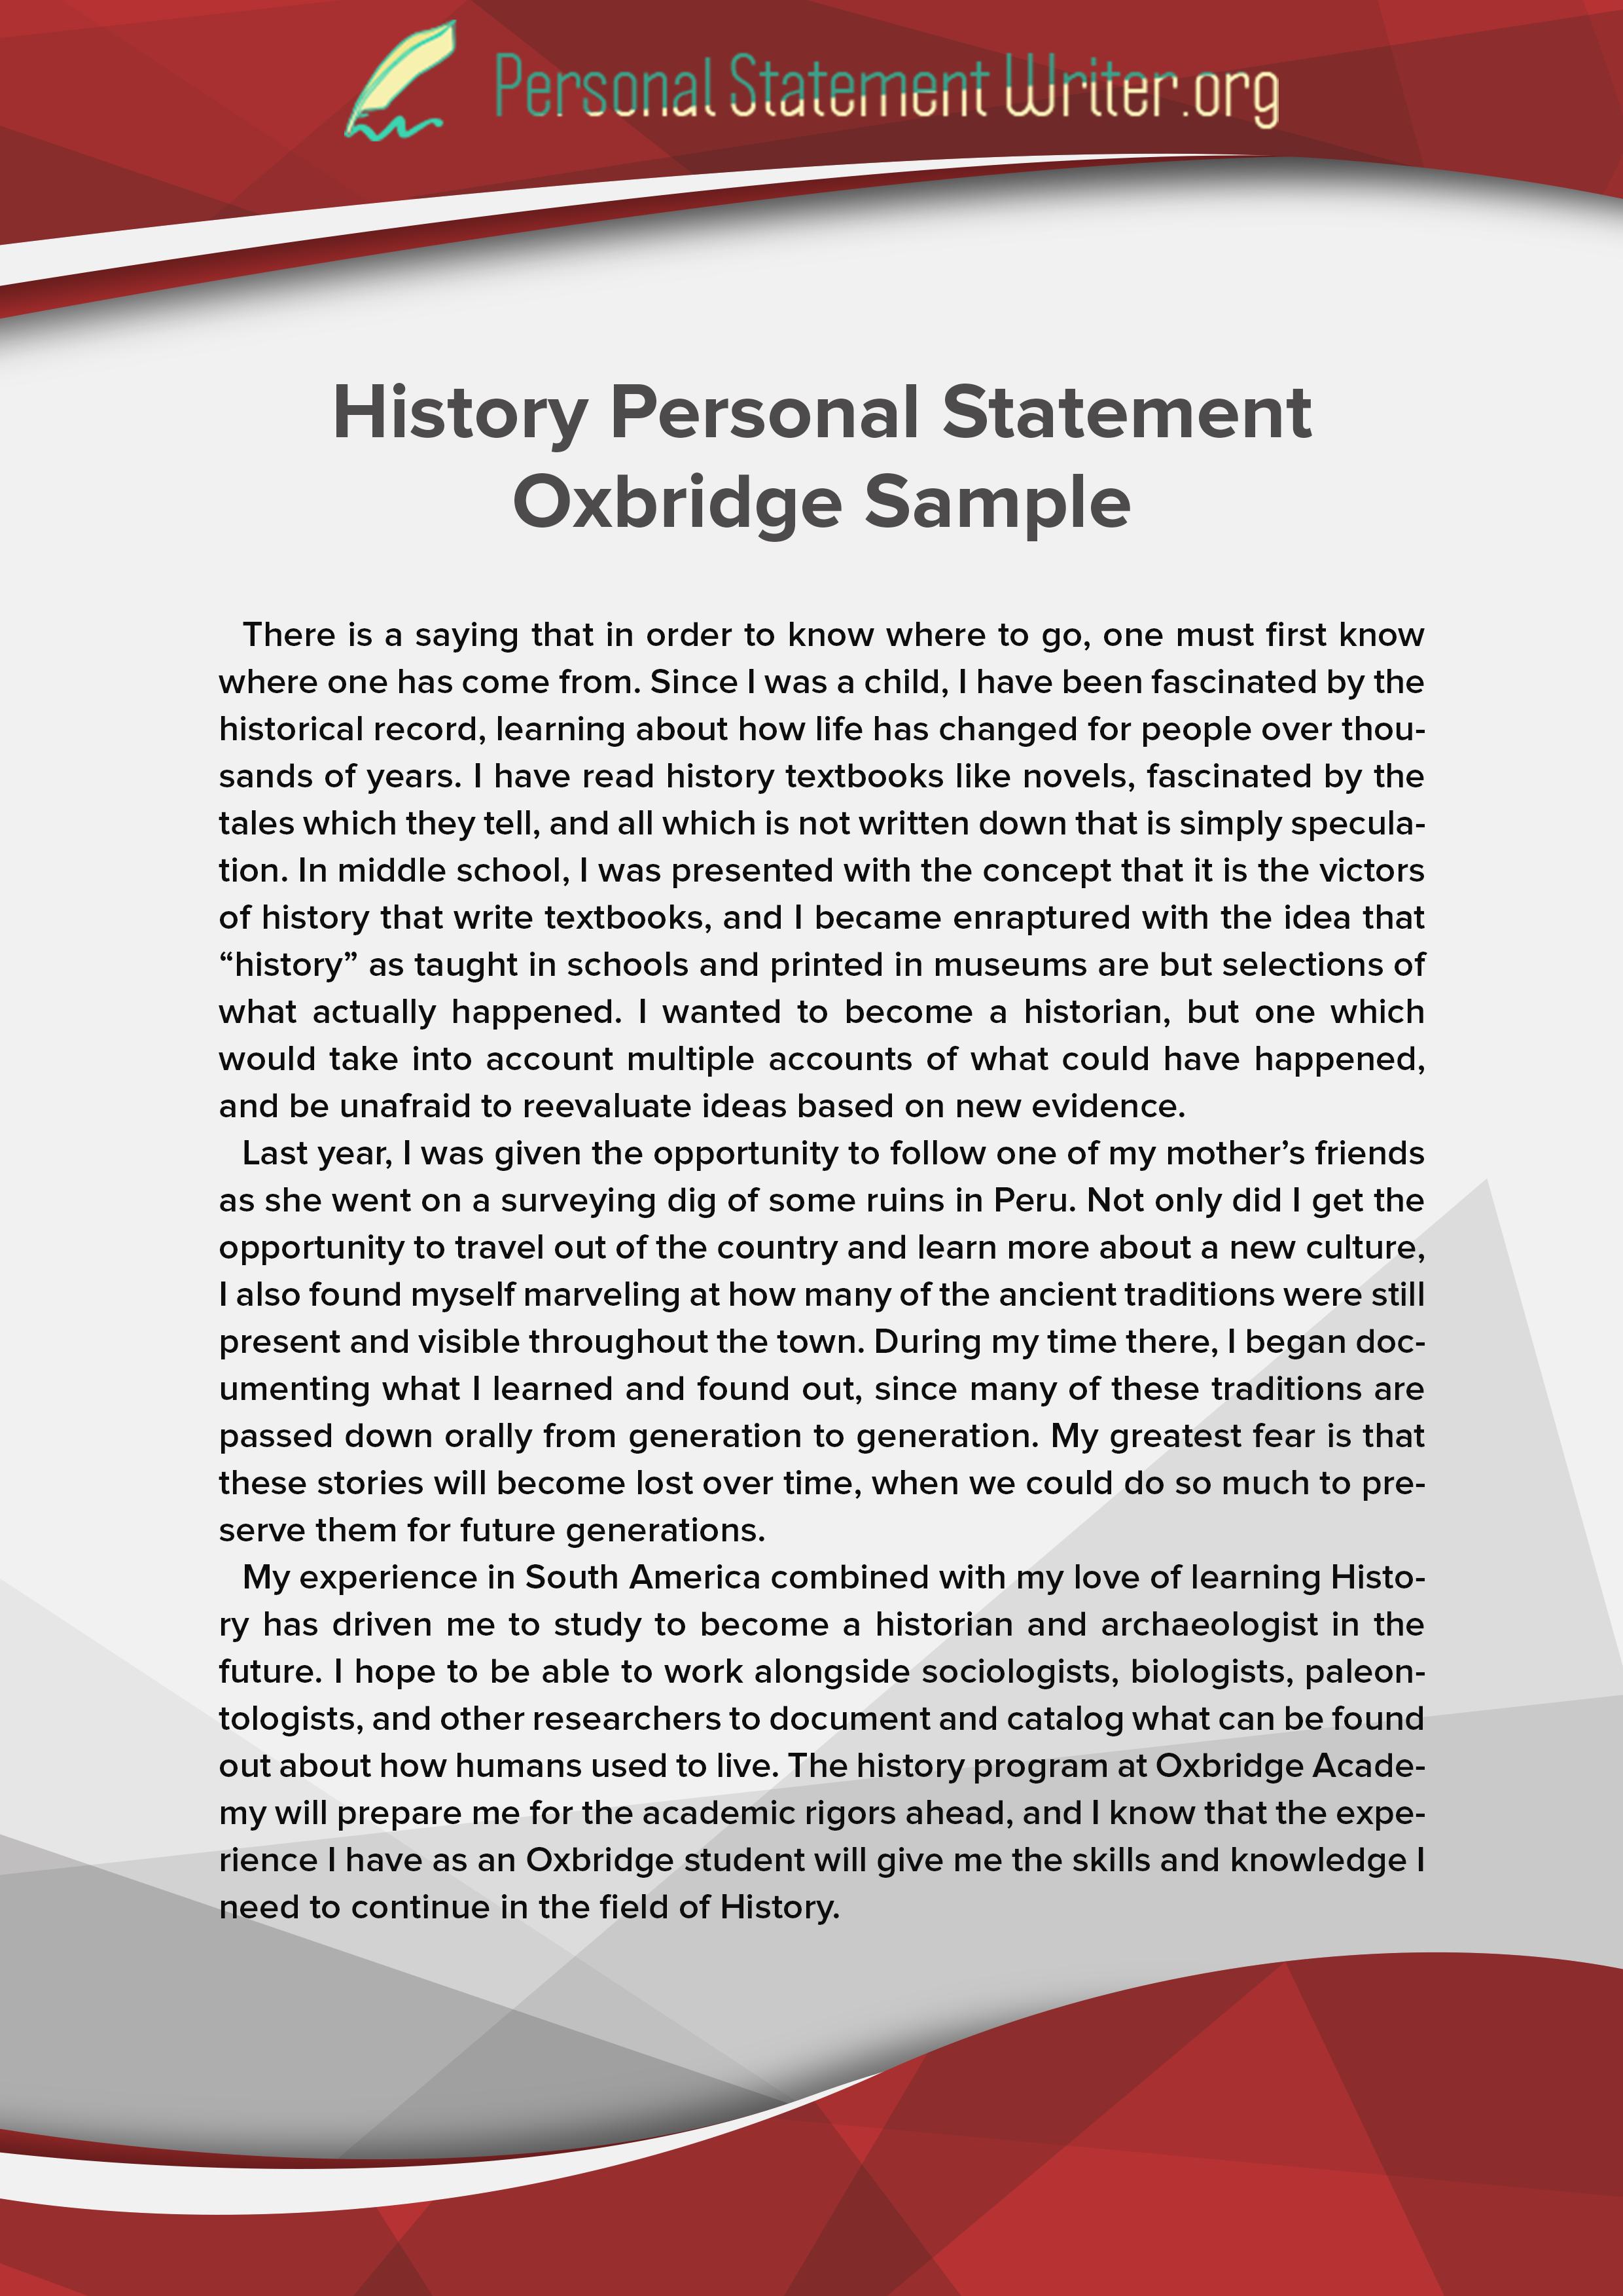 history personal statement oxbridge sample